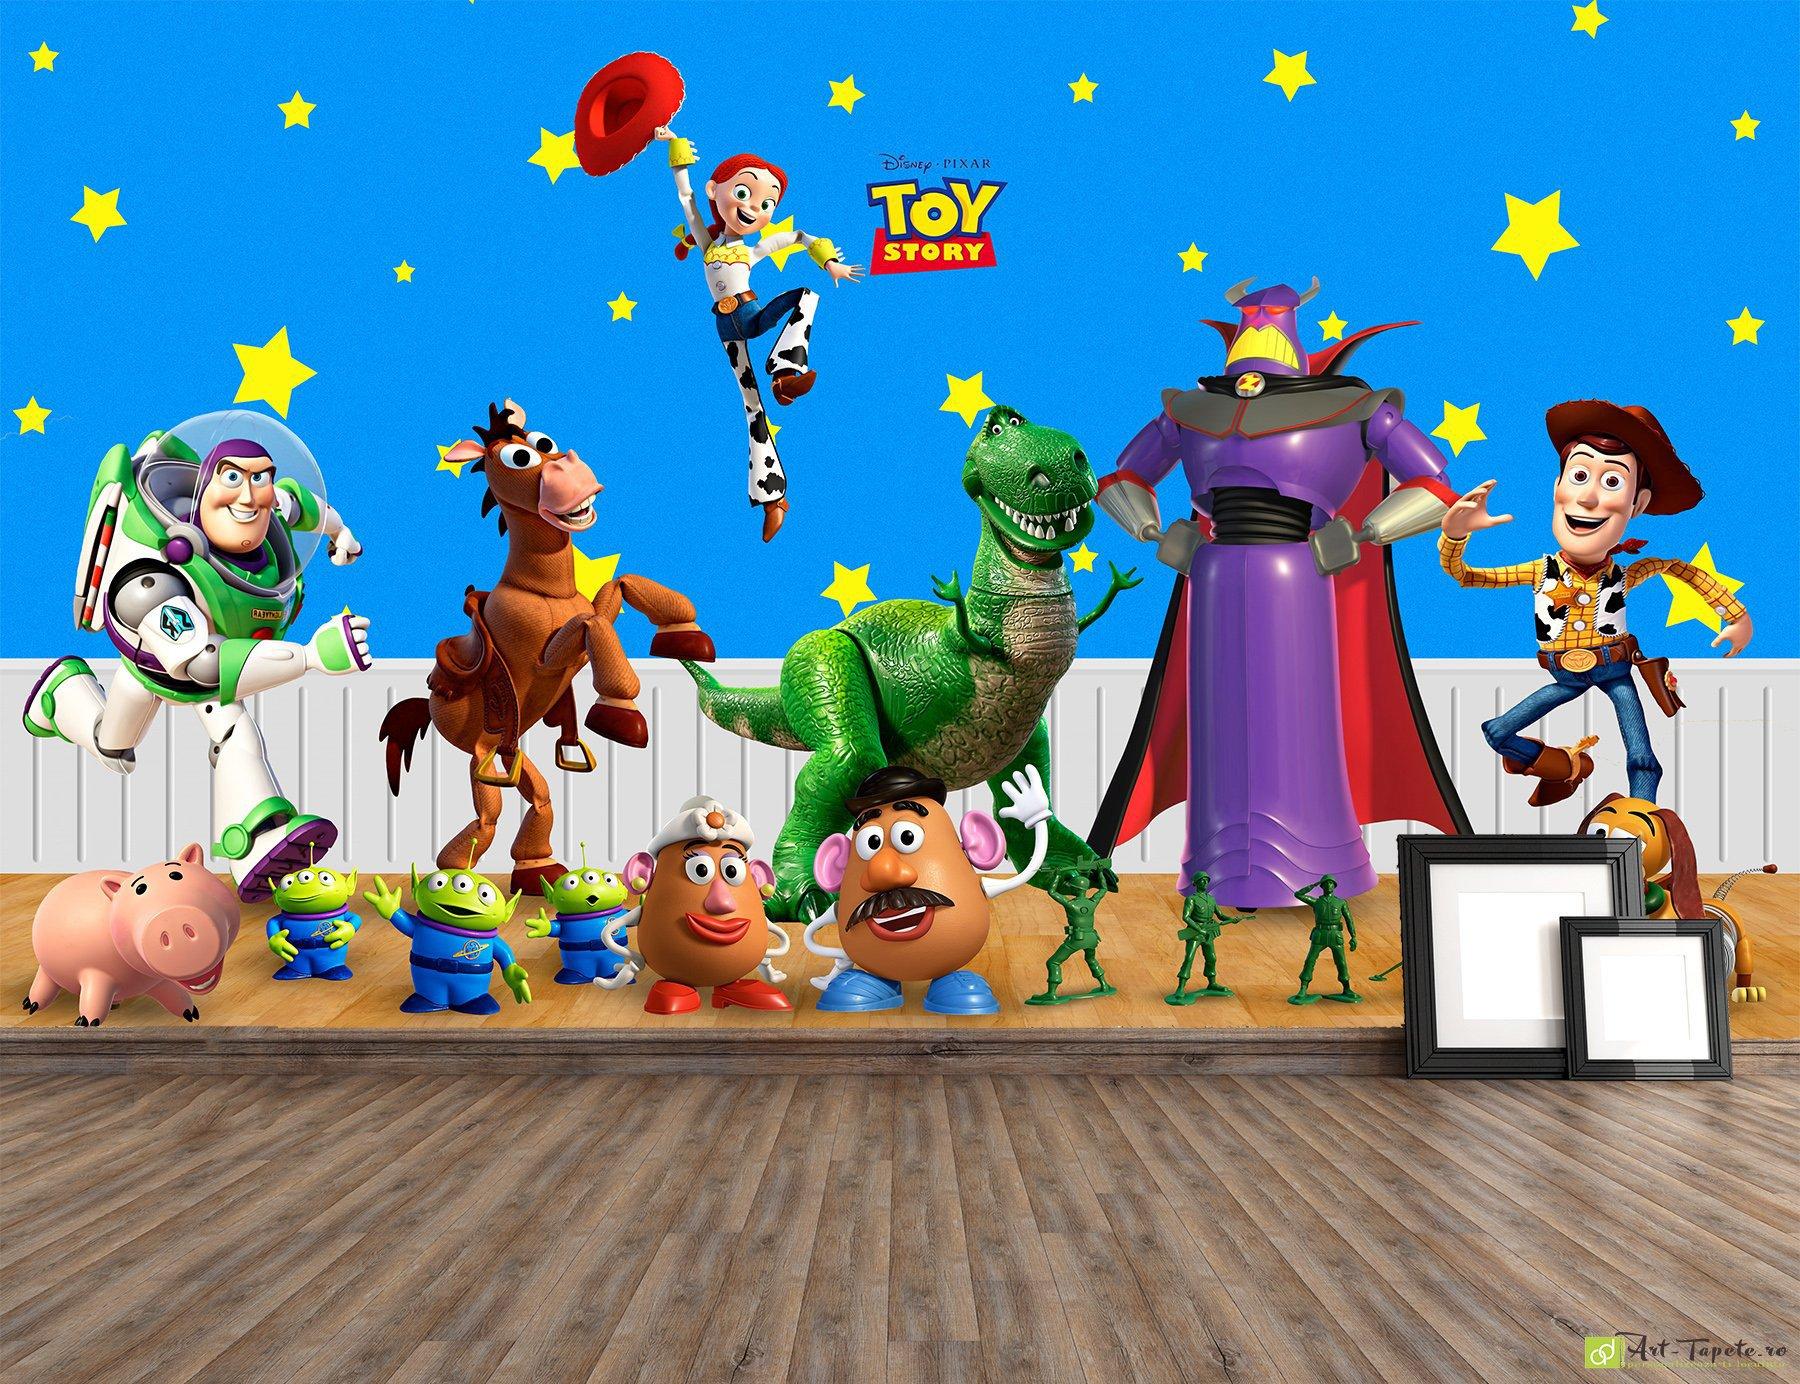 Children S Wallpaper Wall Murals Toy Story Disney Fototapet Art Digital Wallpaper The Best Selection Of Wall Murals And Photo Murals For Children S Buy Online